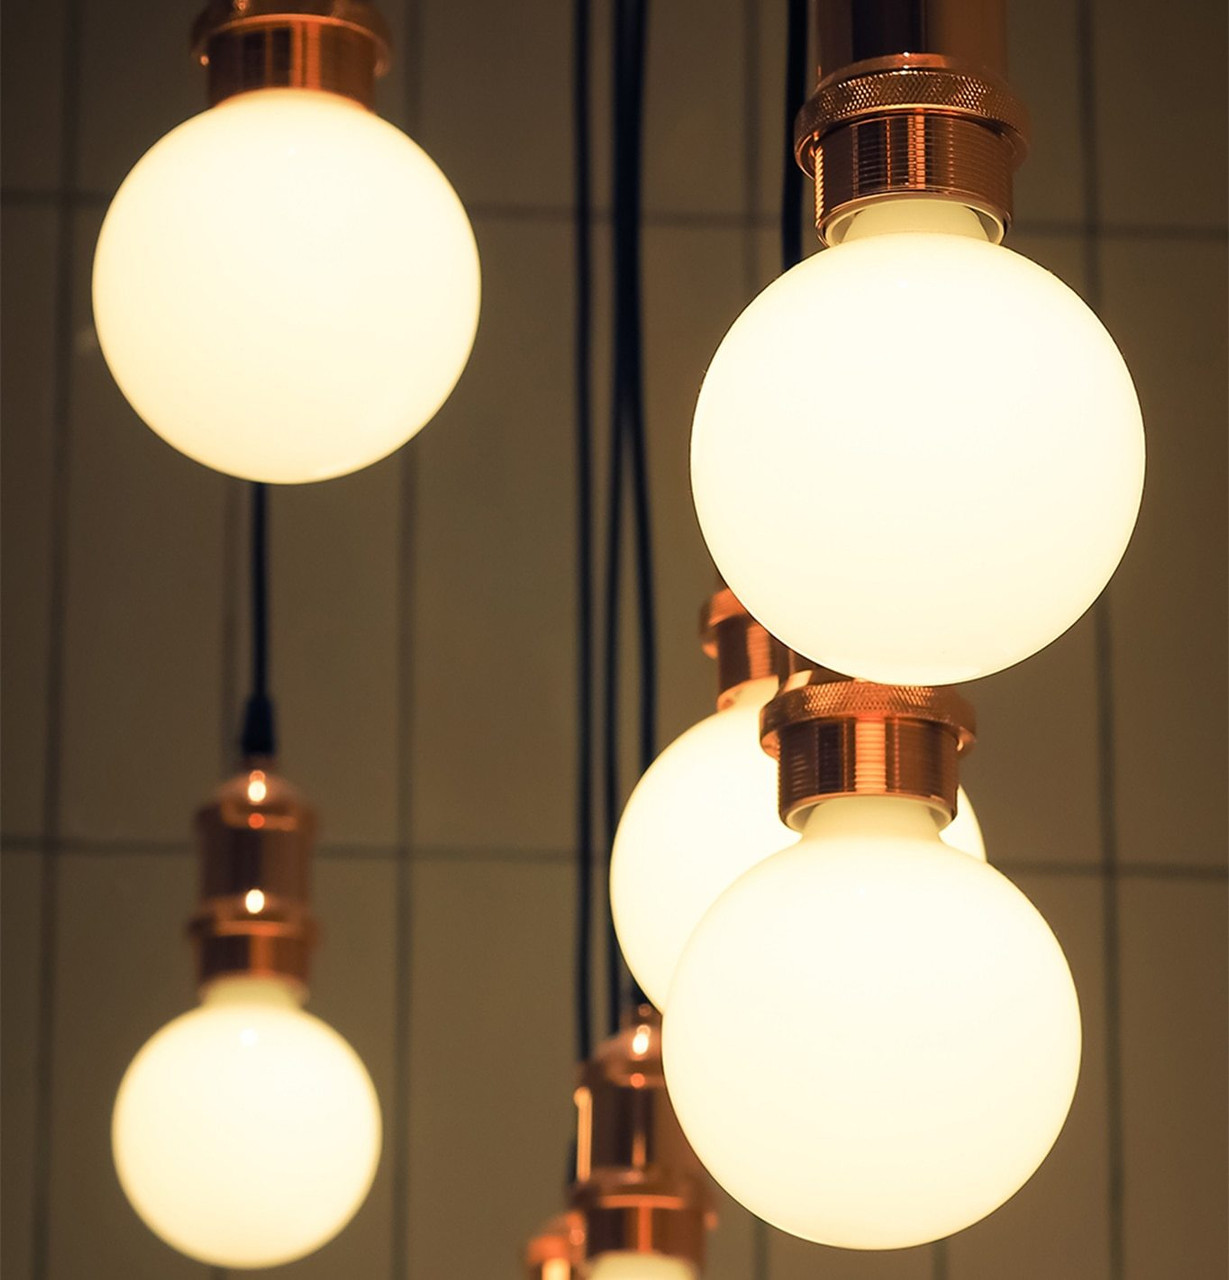 LED G125 ES Light Bulbs